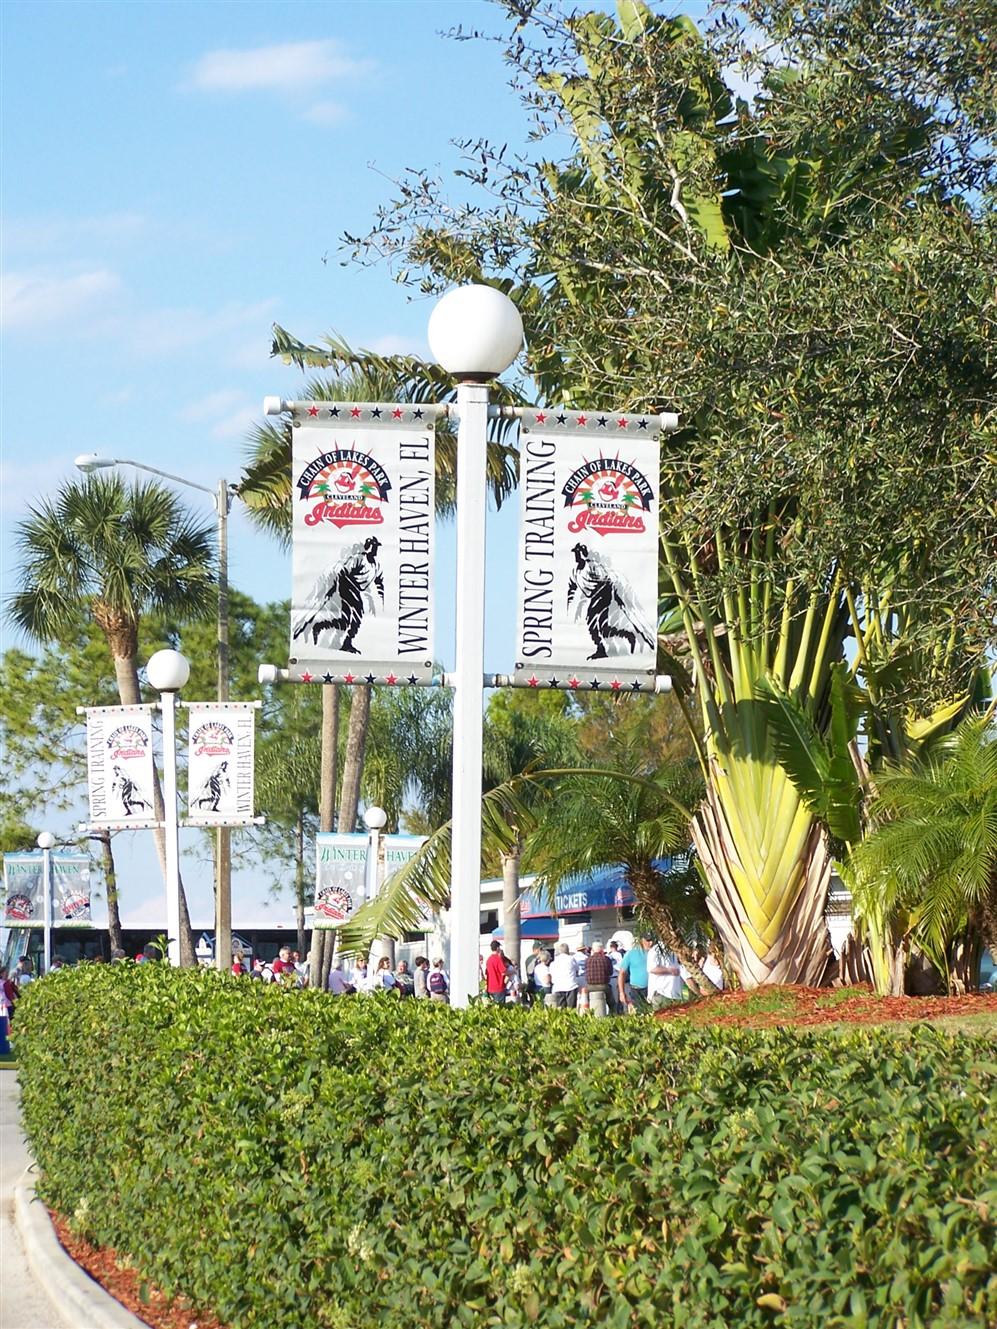 2007 03 09 37 Cleveland Indians Spring Training Winter Haven Florida.jpg